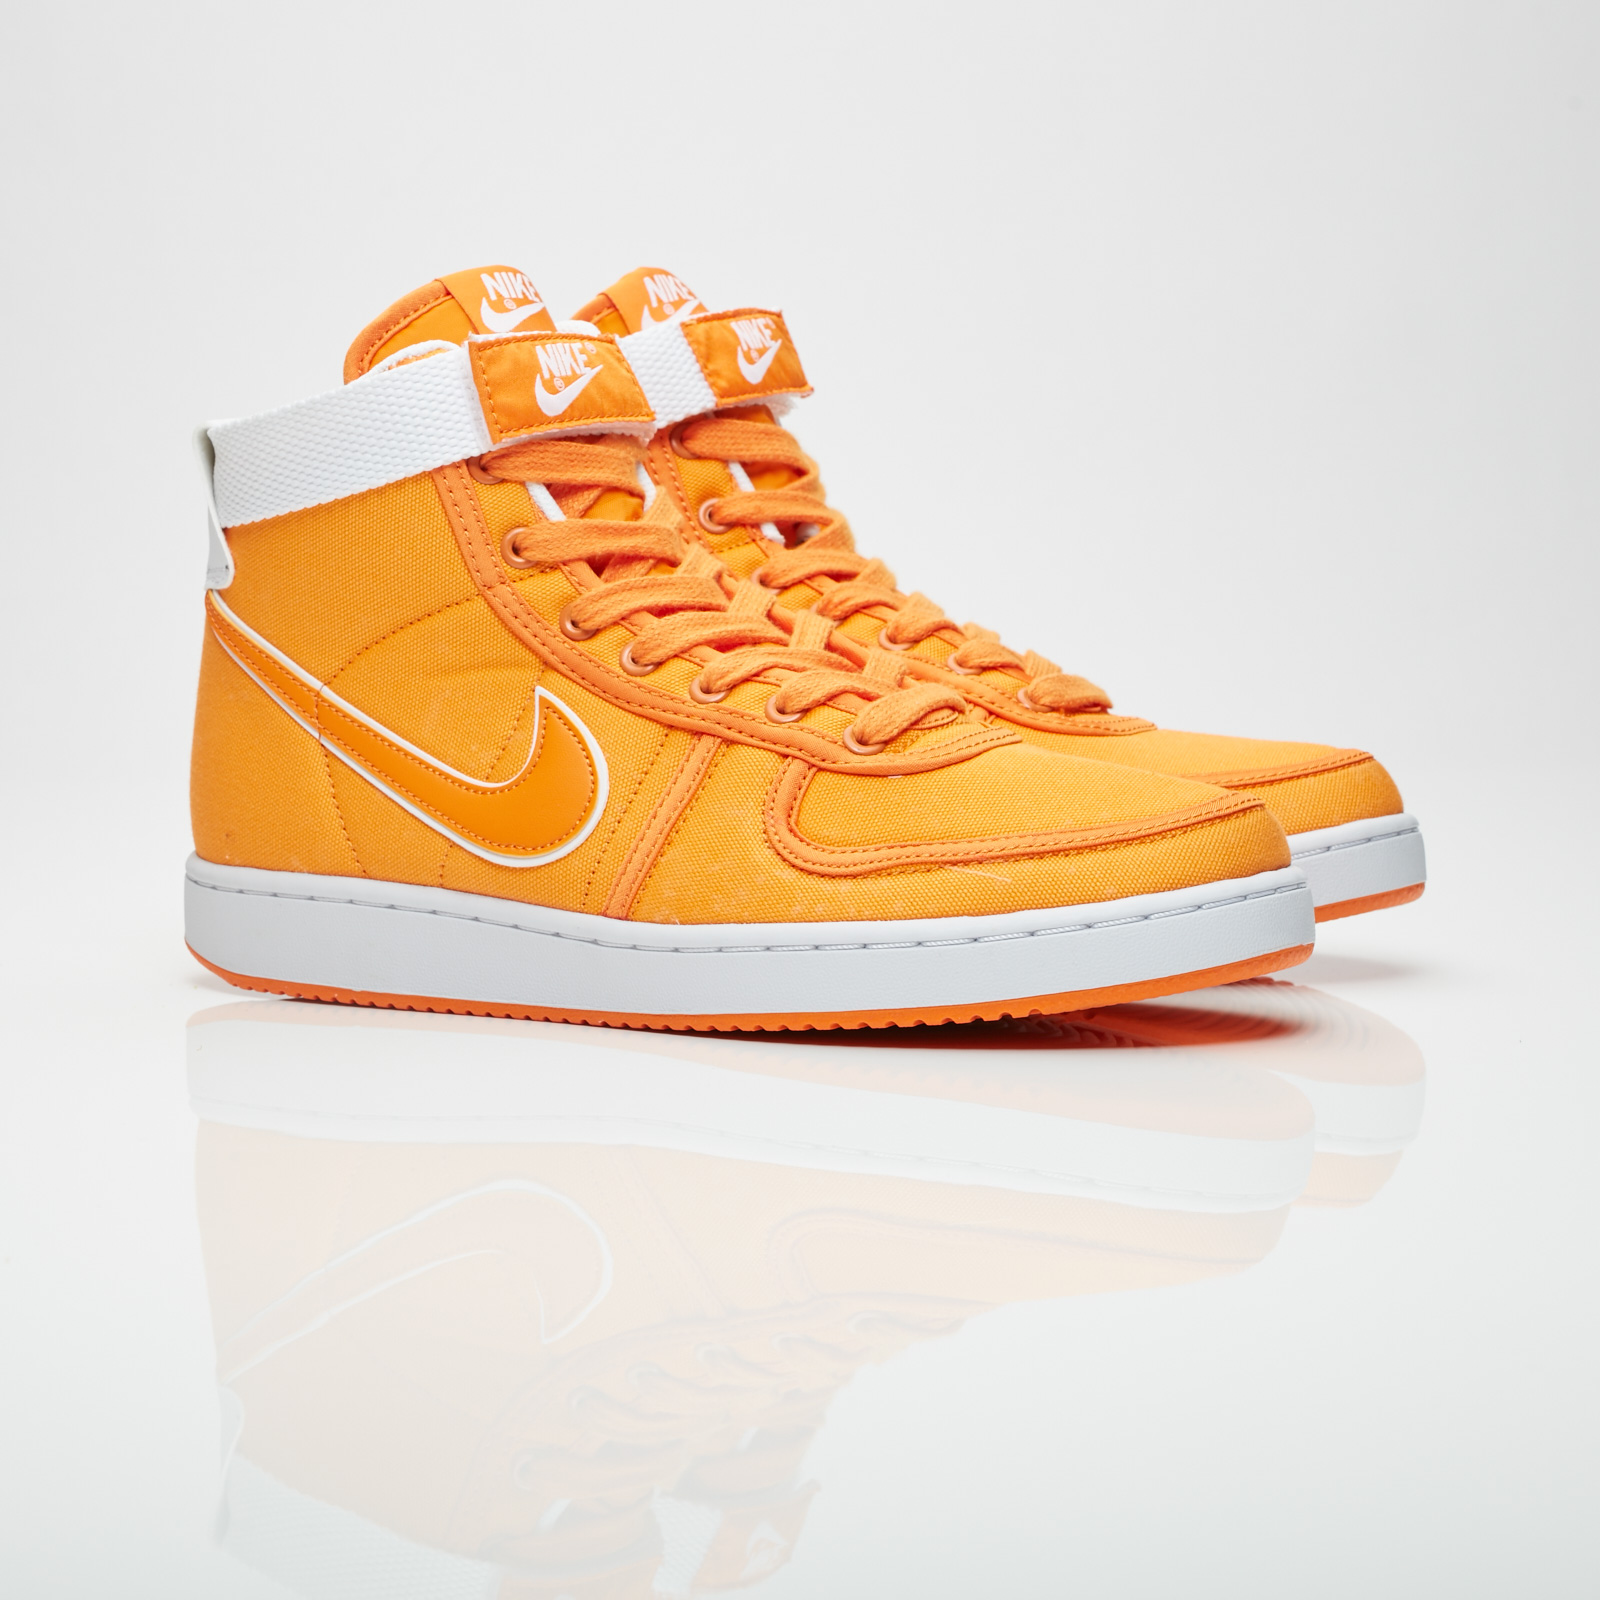 Nike Vandal High Supreme Canvas QS